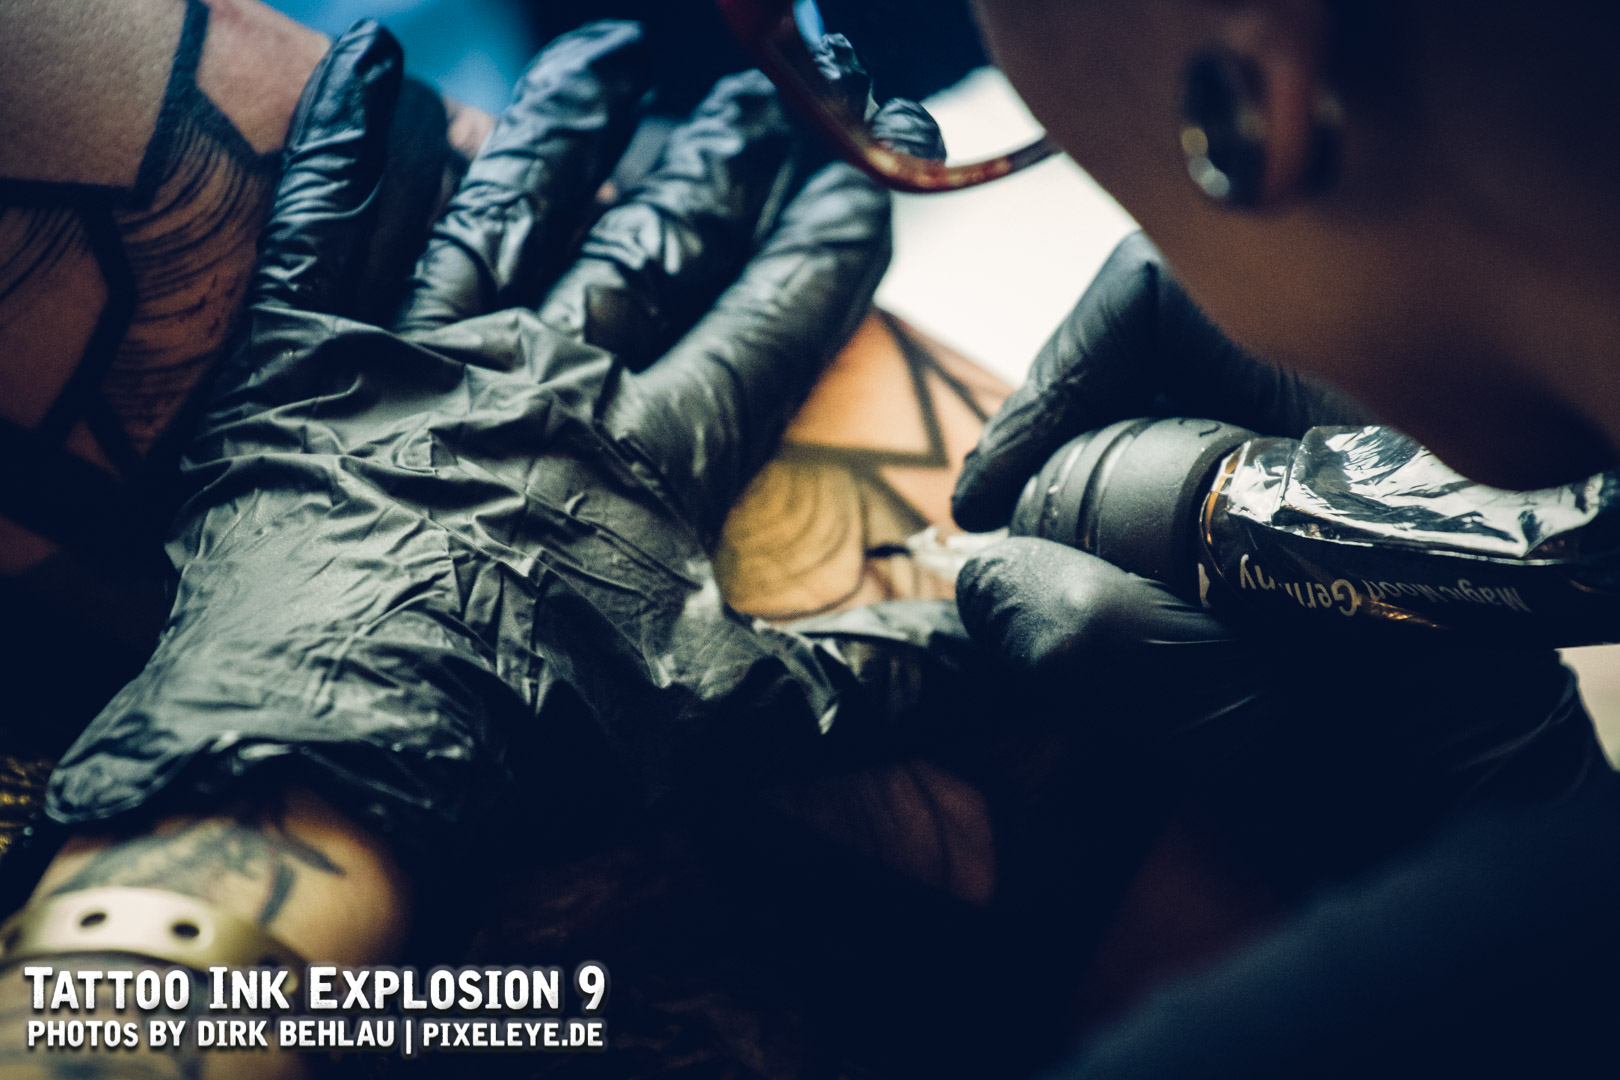 Tattoo Ink Explosion 2018 WEB by Dirk Behlau-1241.jpg